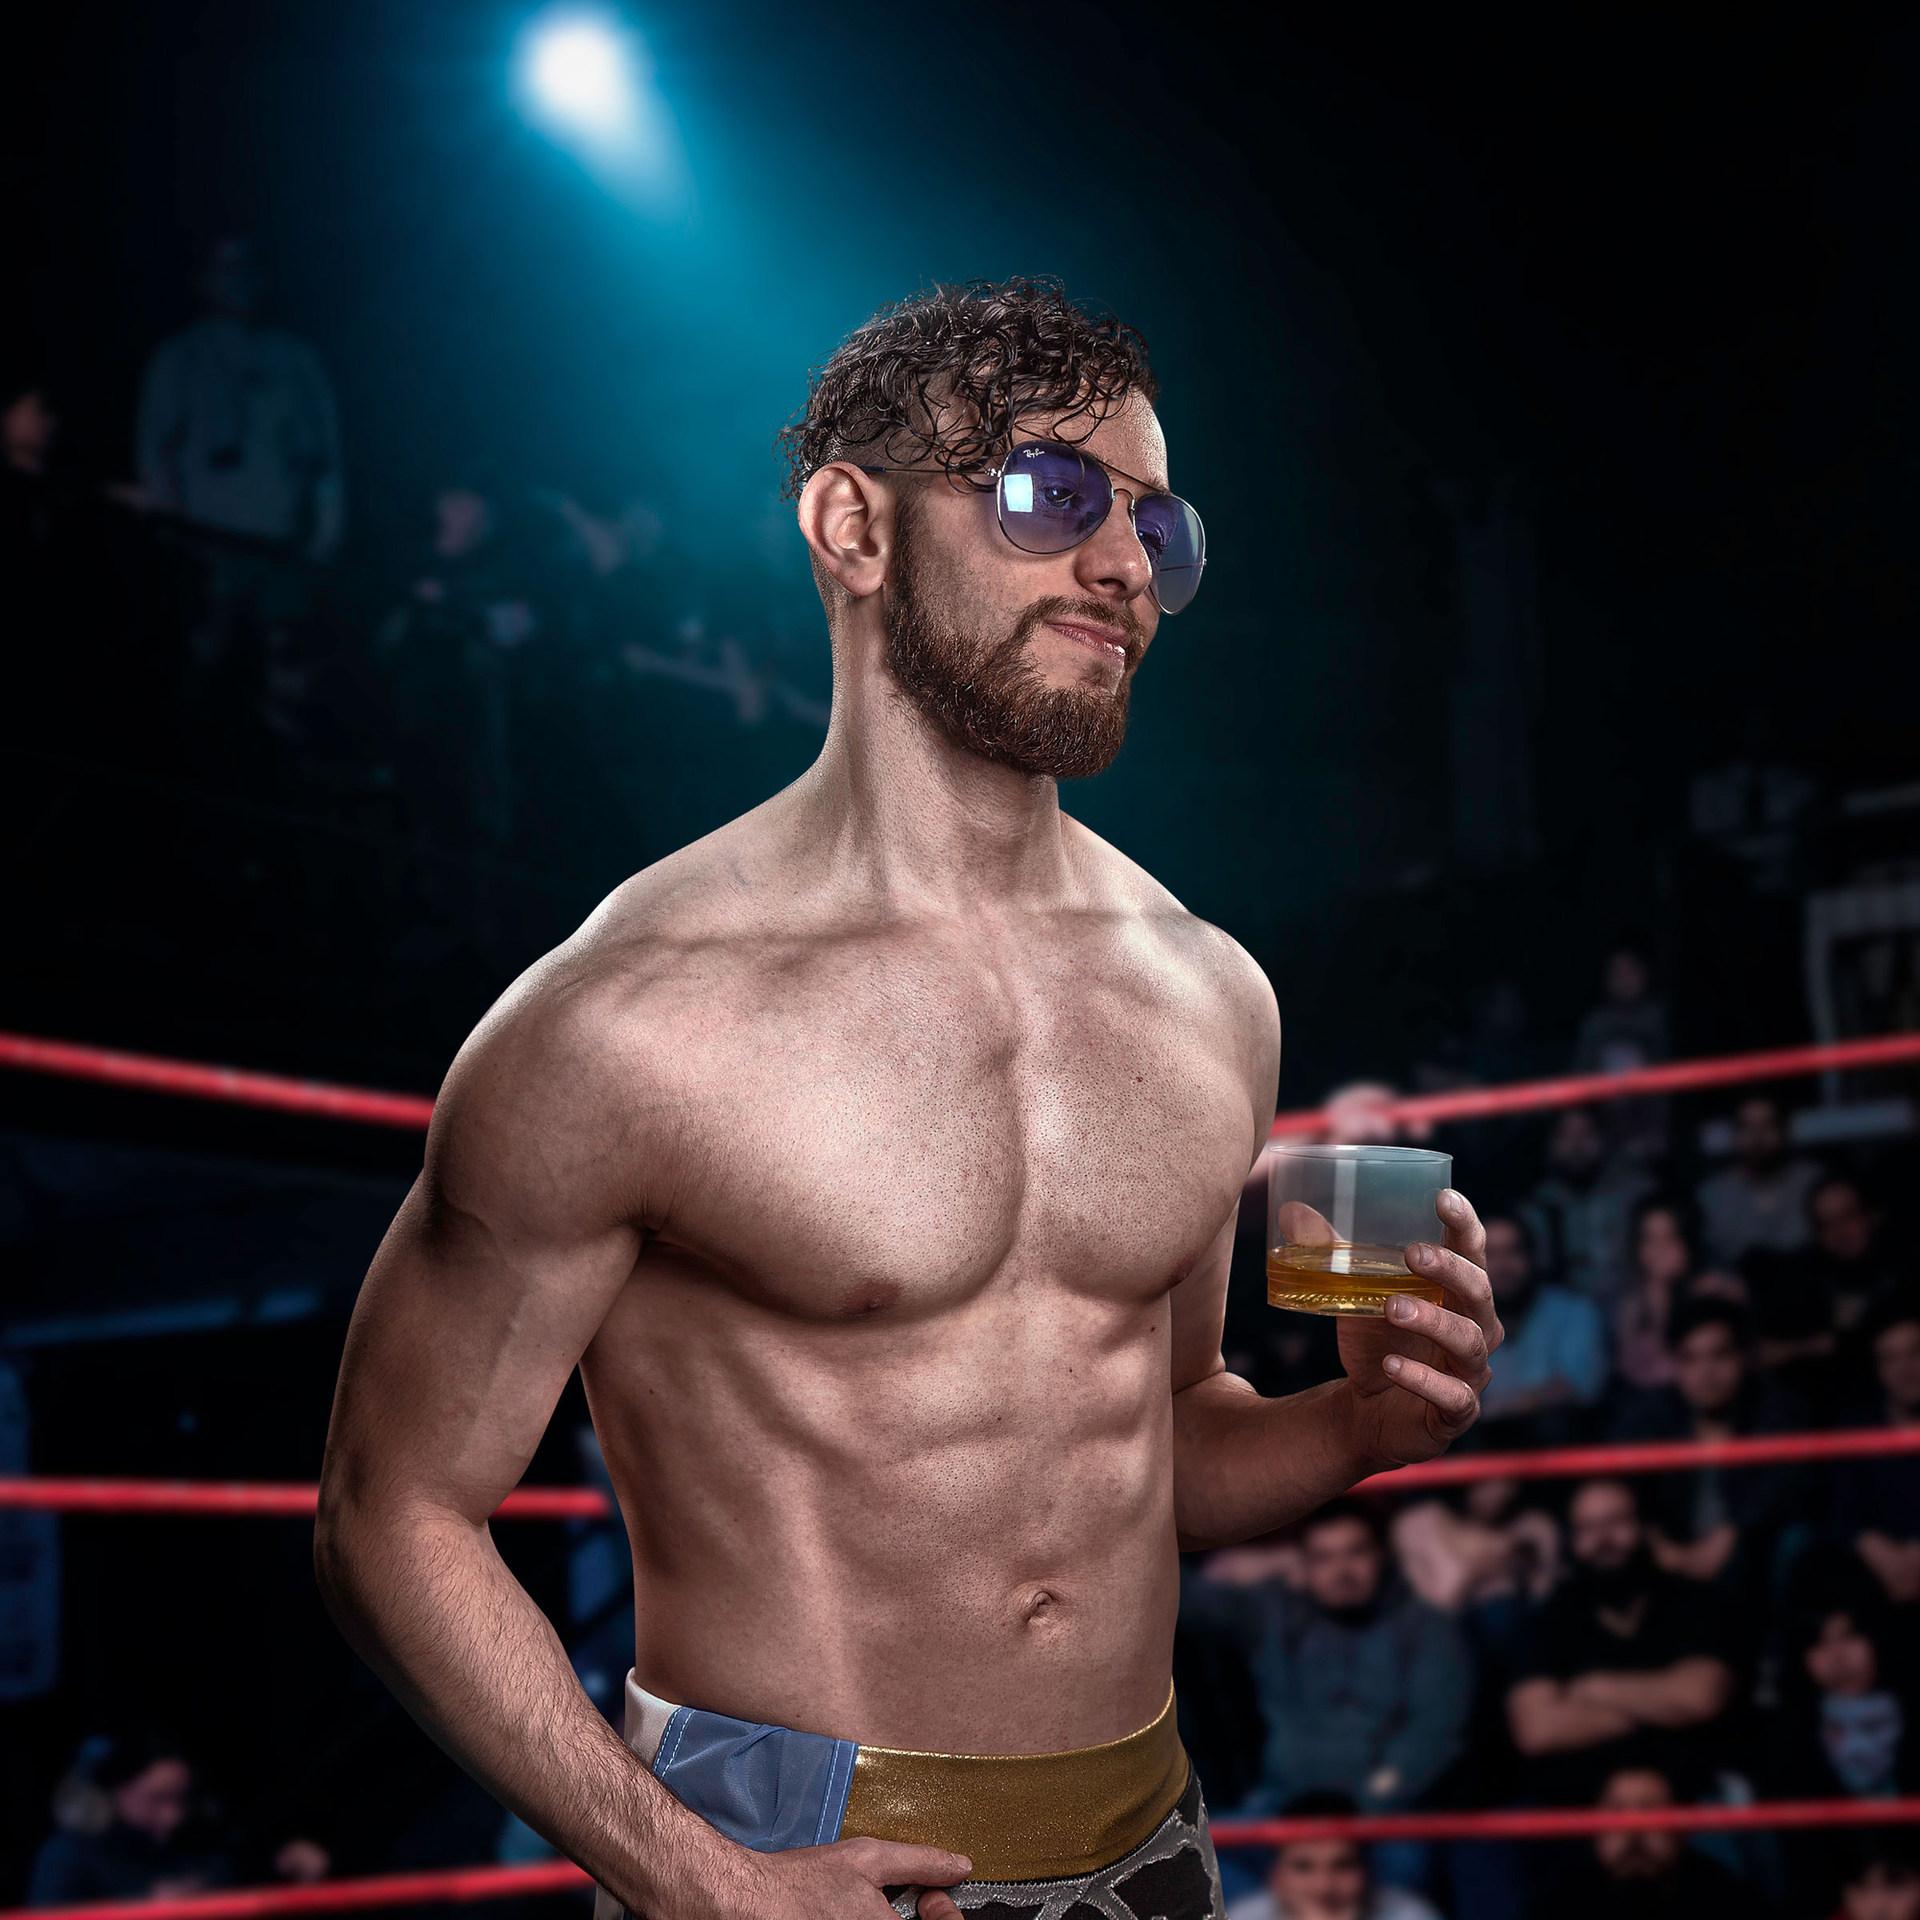 Retrato CNL - Campeonato Nacional de Lucha - Pro Wrestling Photography